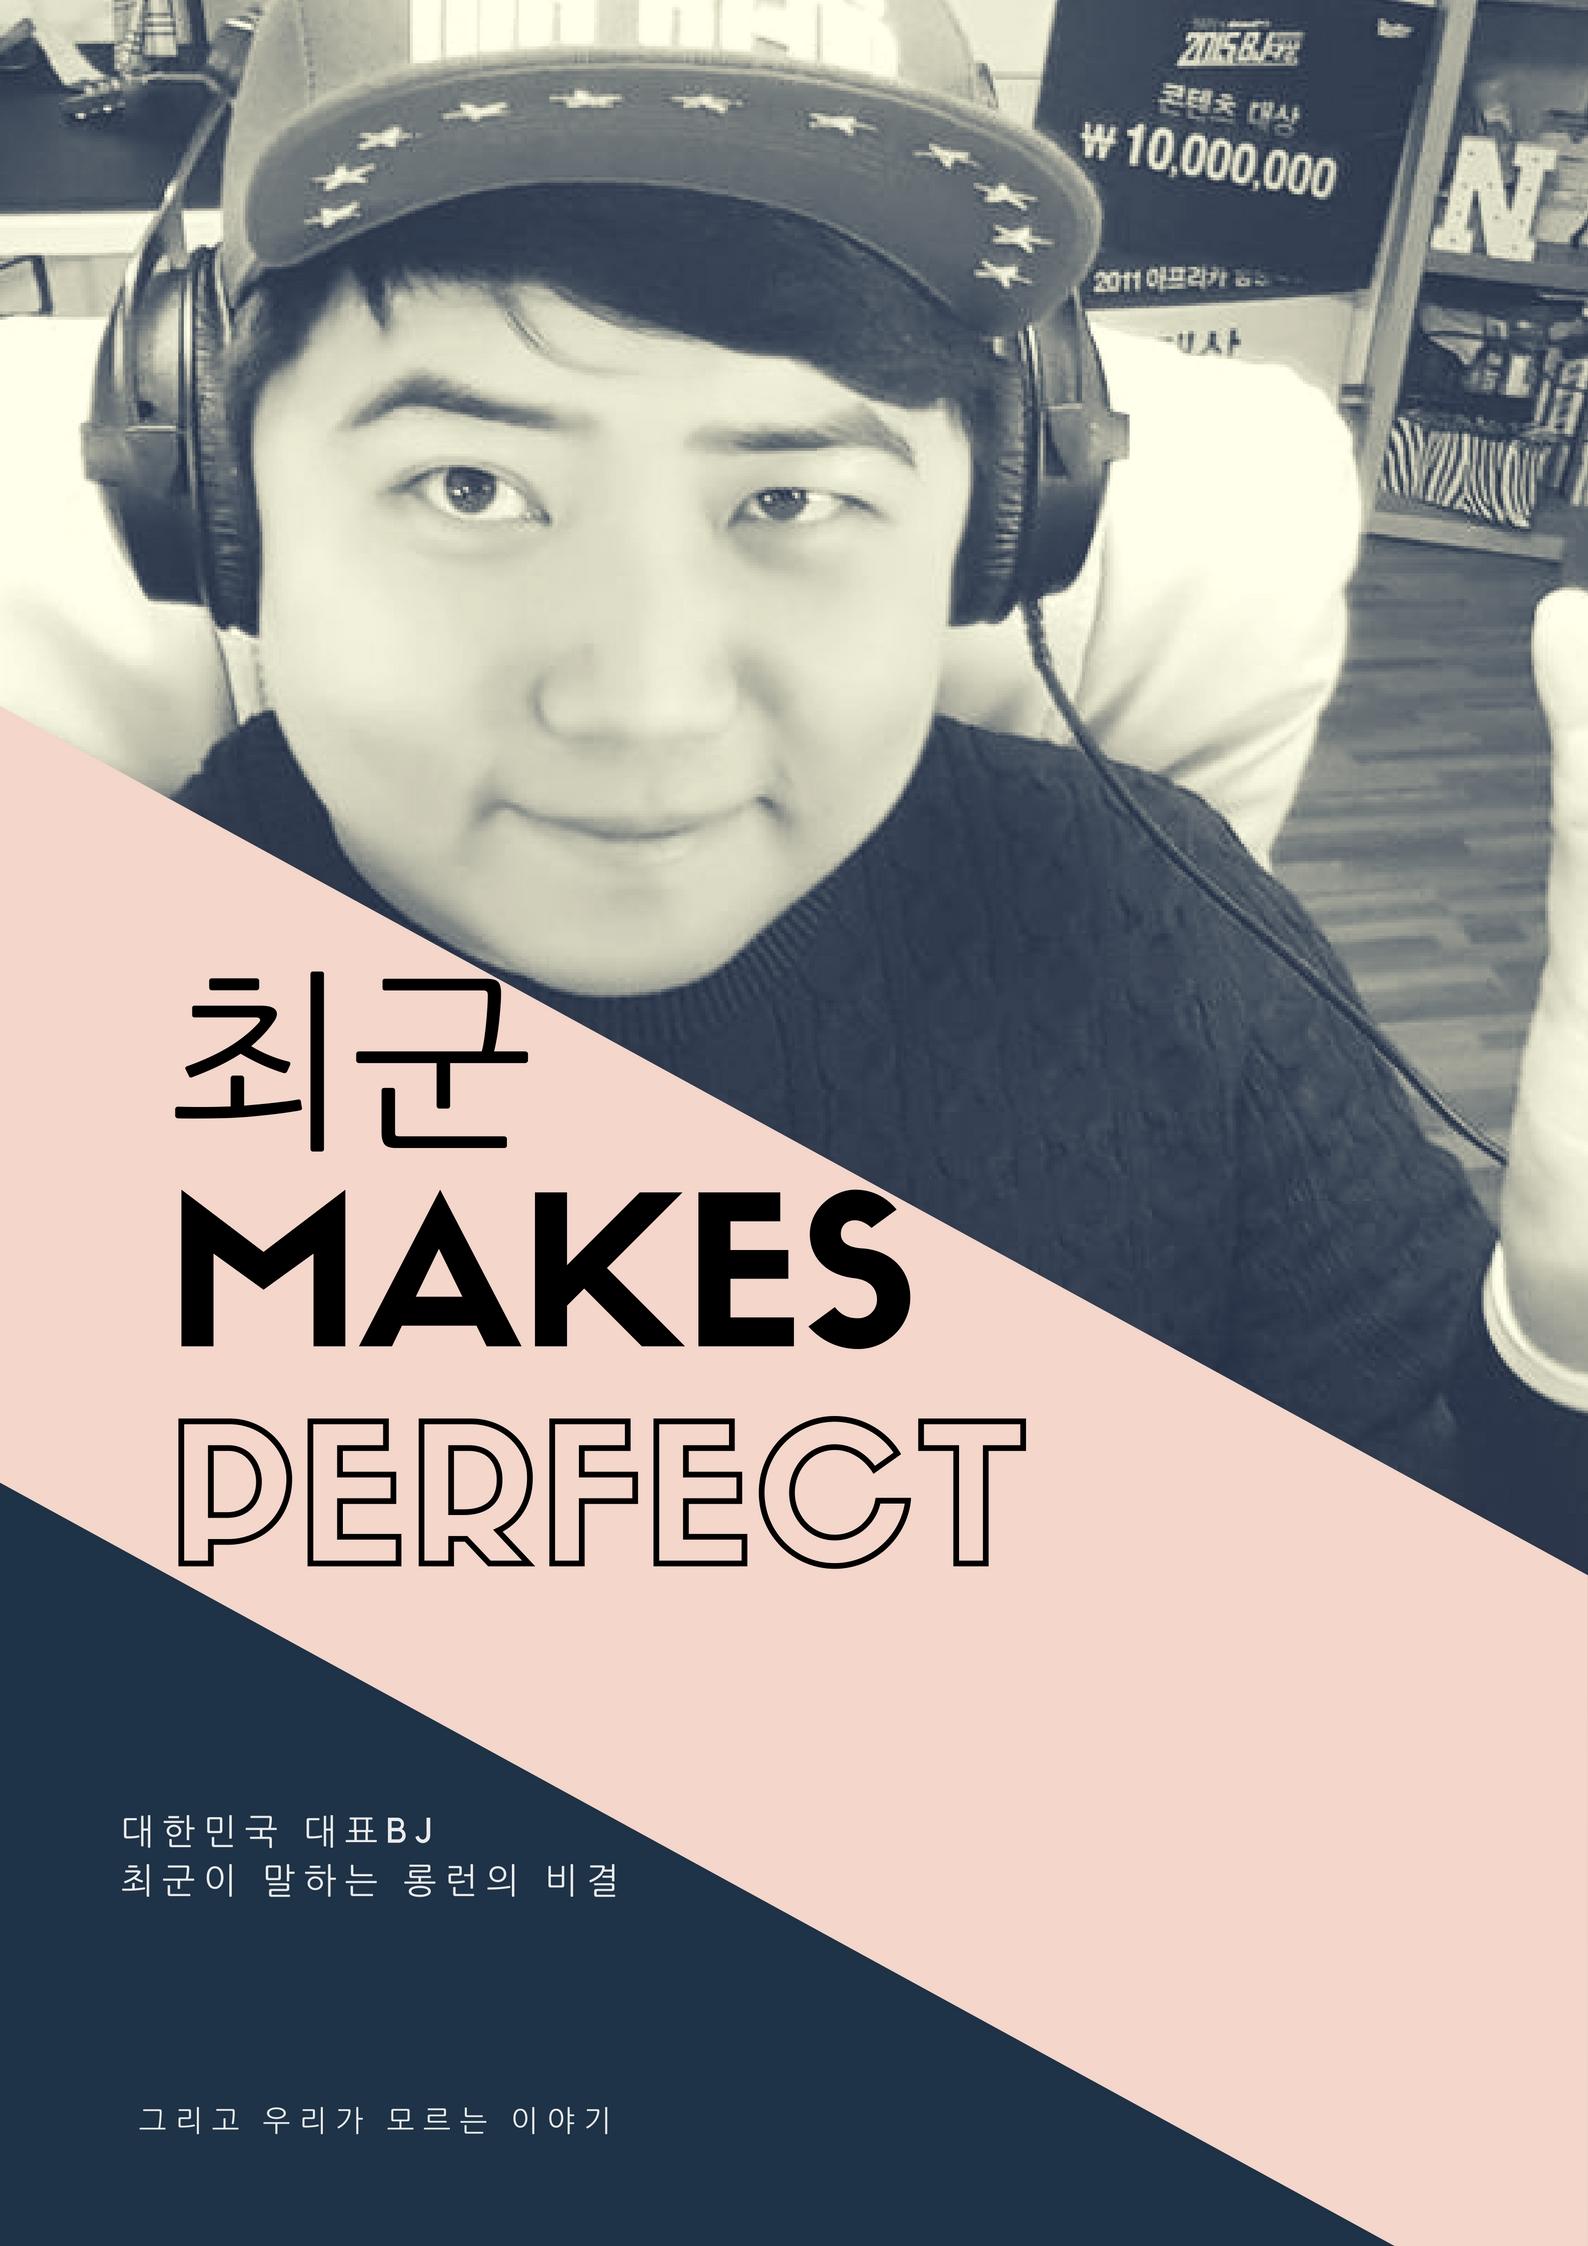 Images - Afreeca Tv Korean Webcamsmall Baby